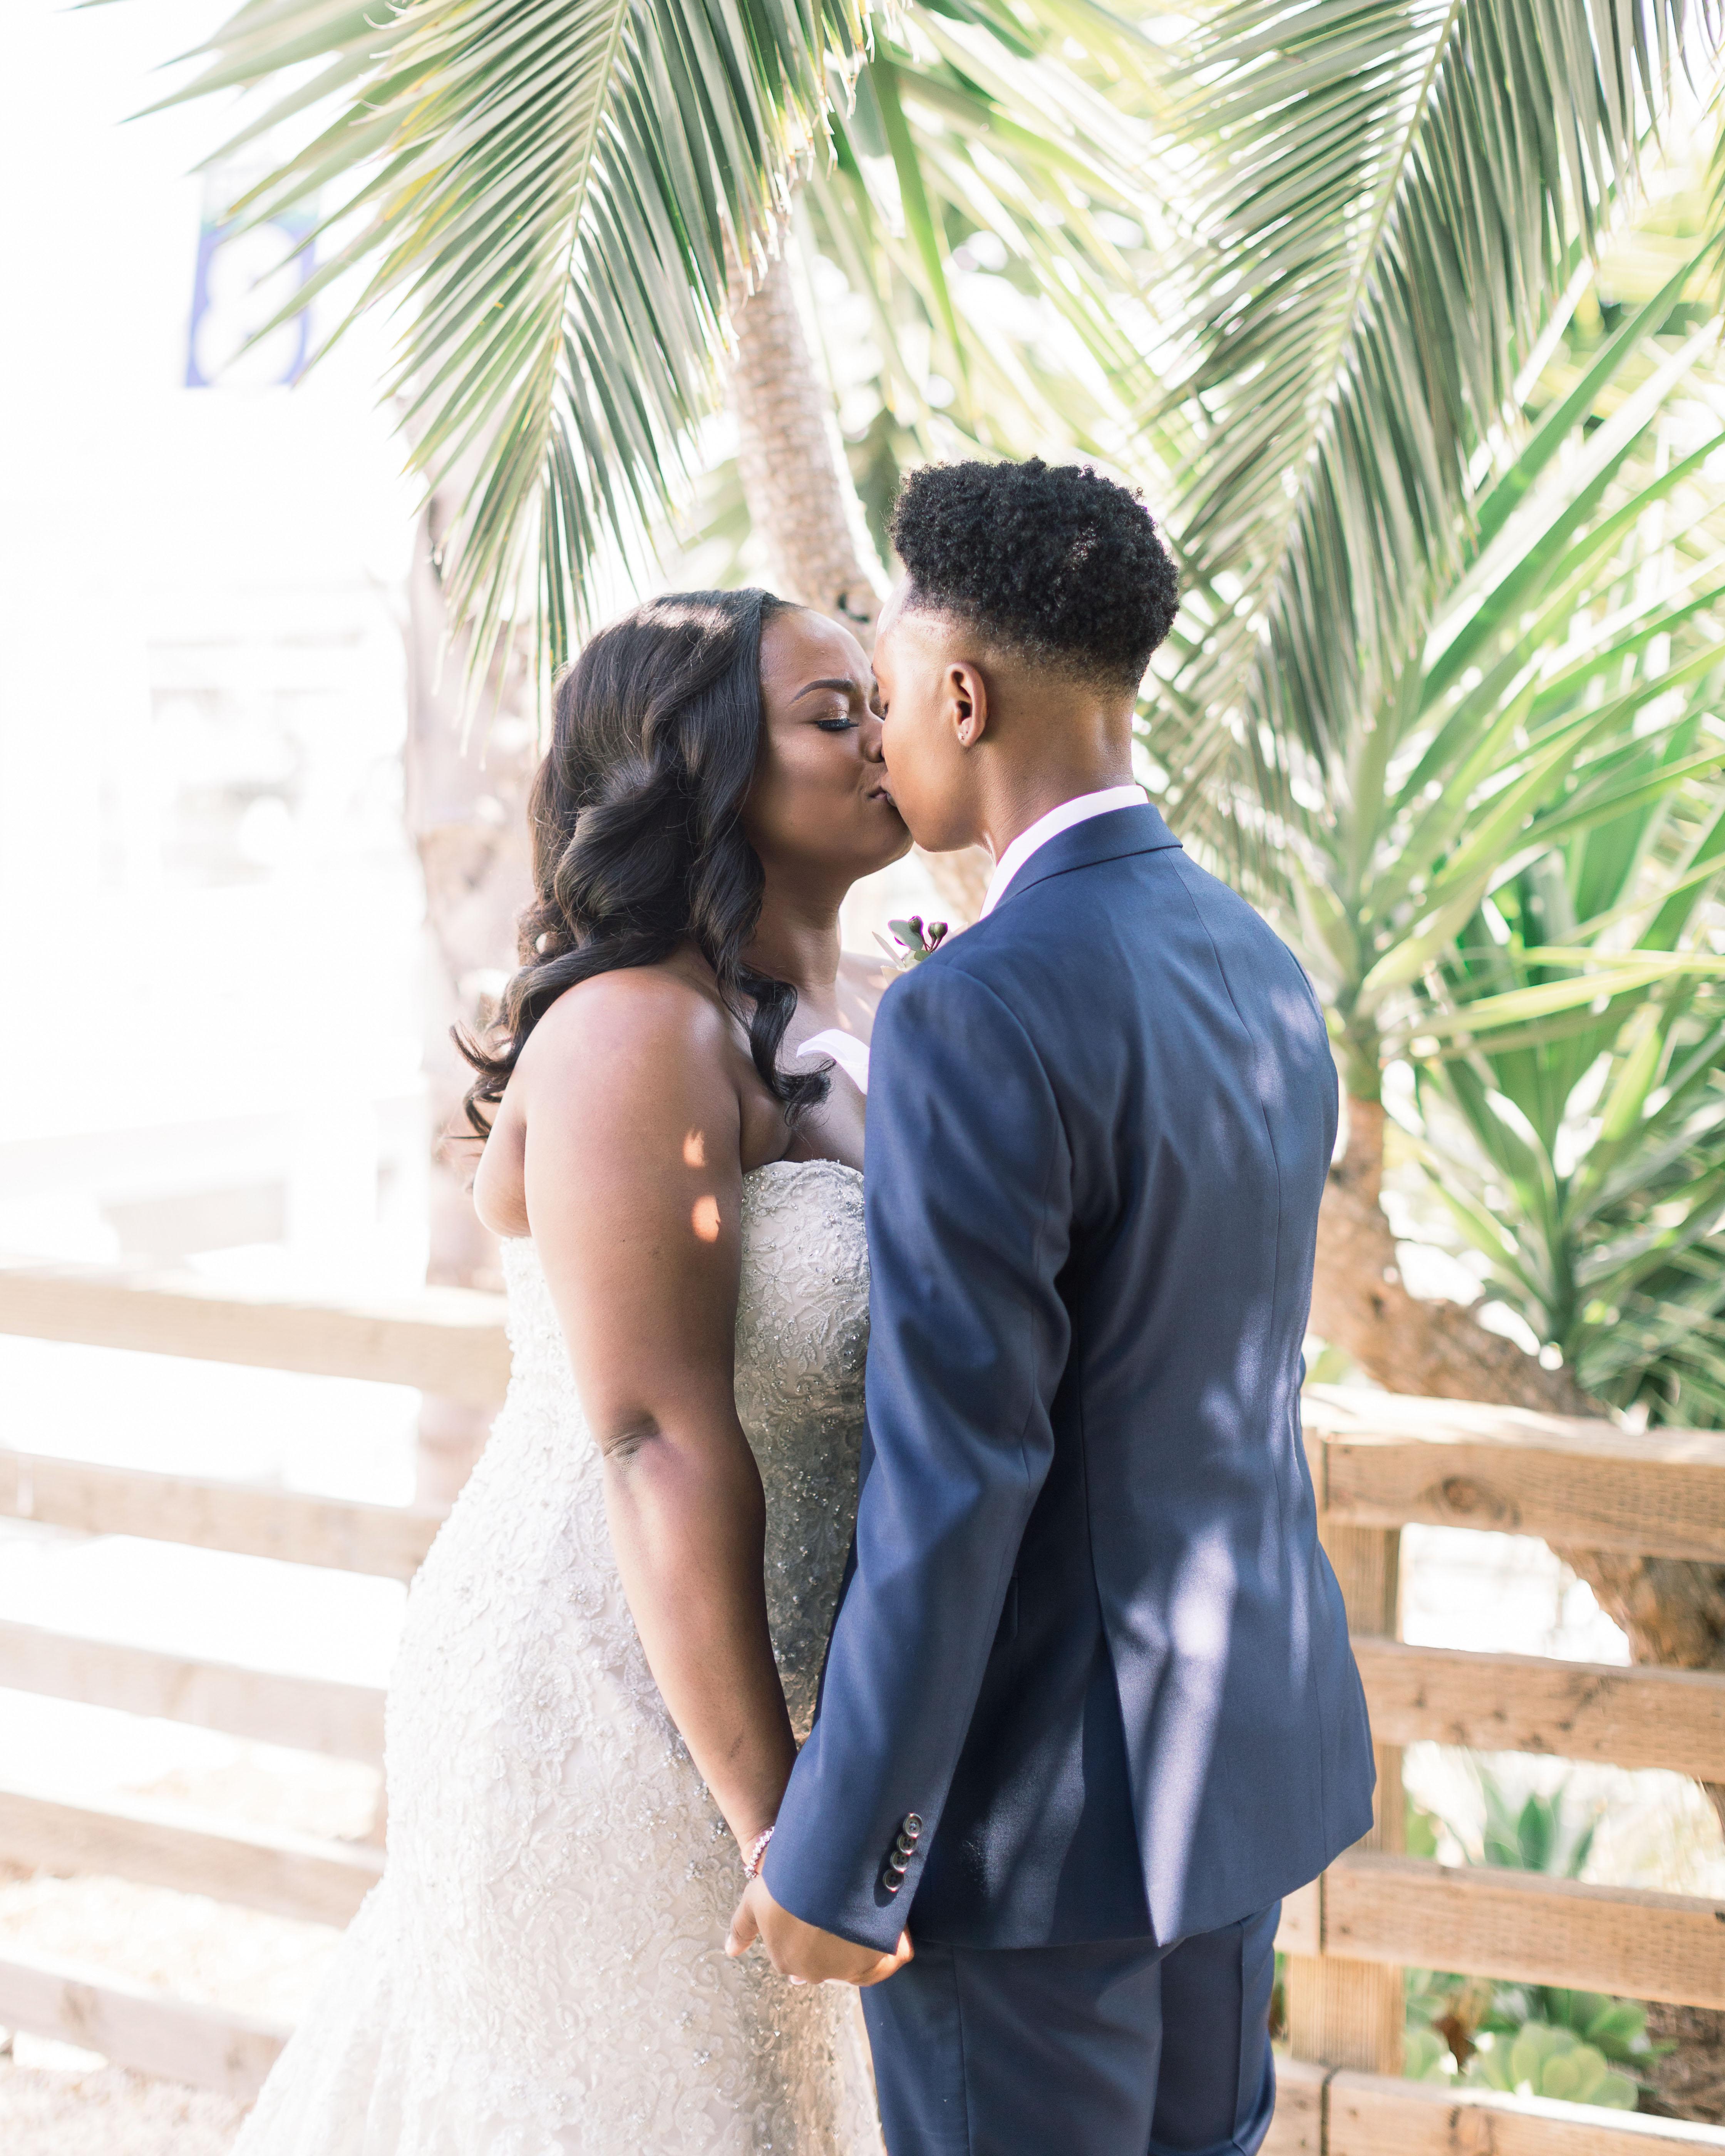 outdoor wedding kiss under tropical tree